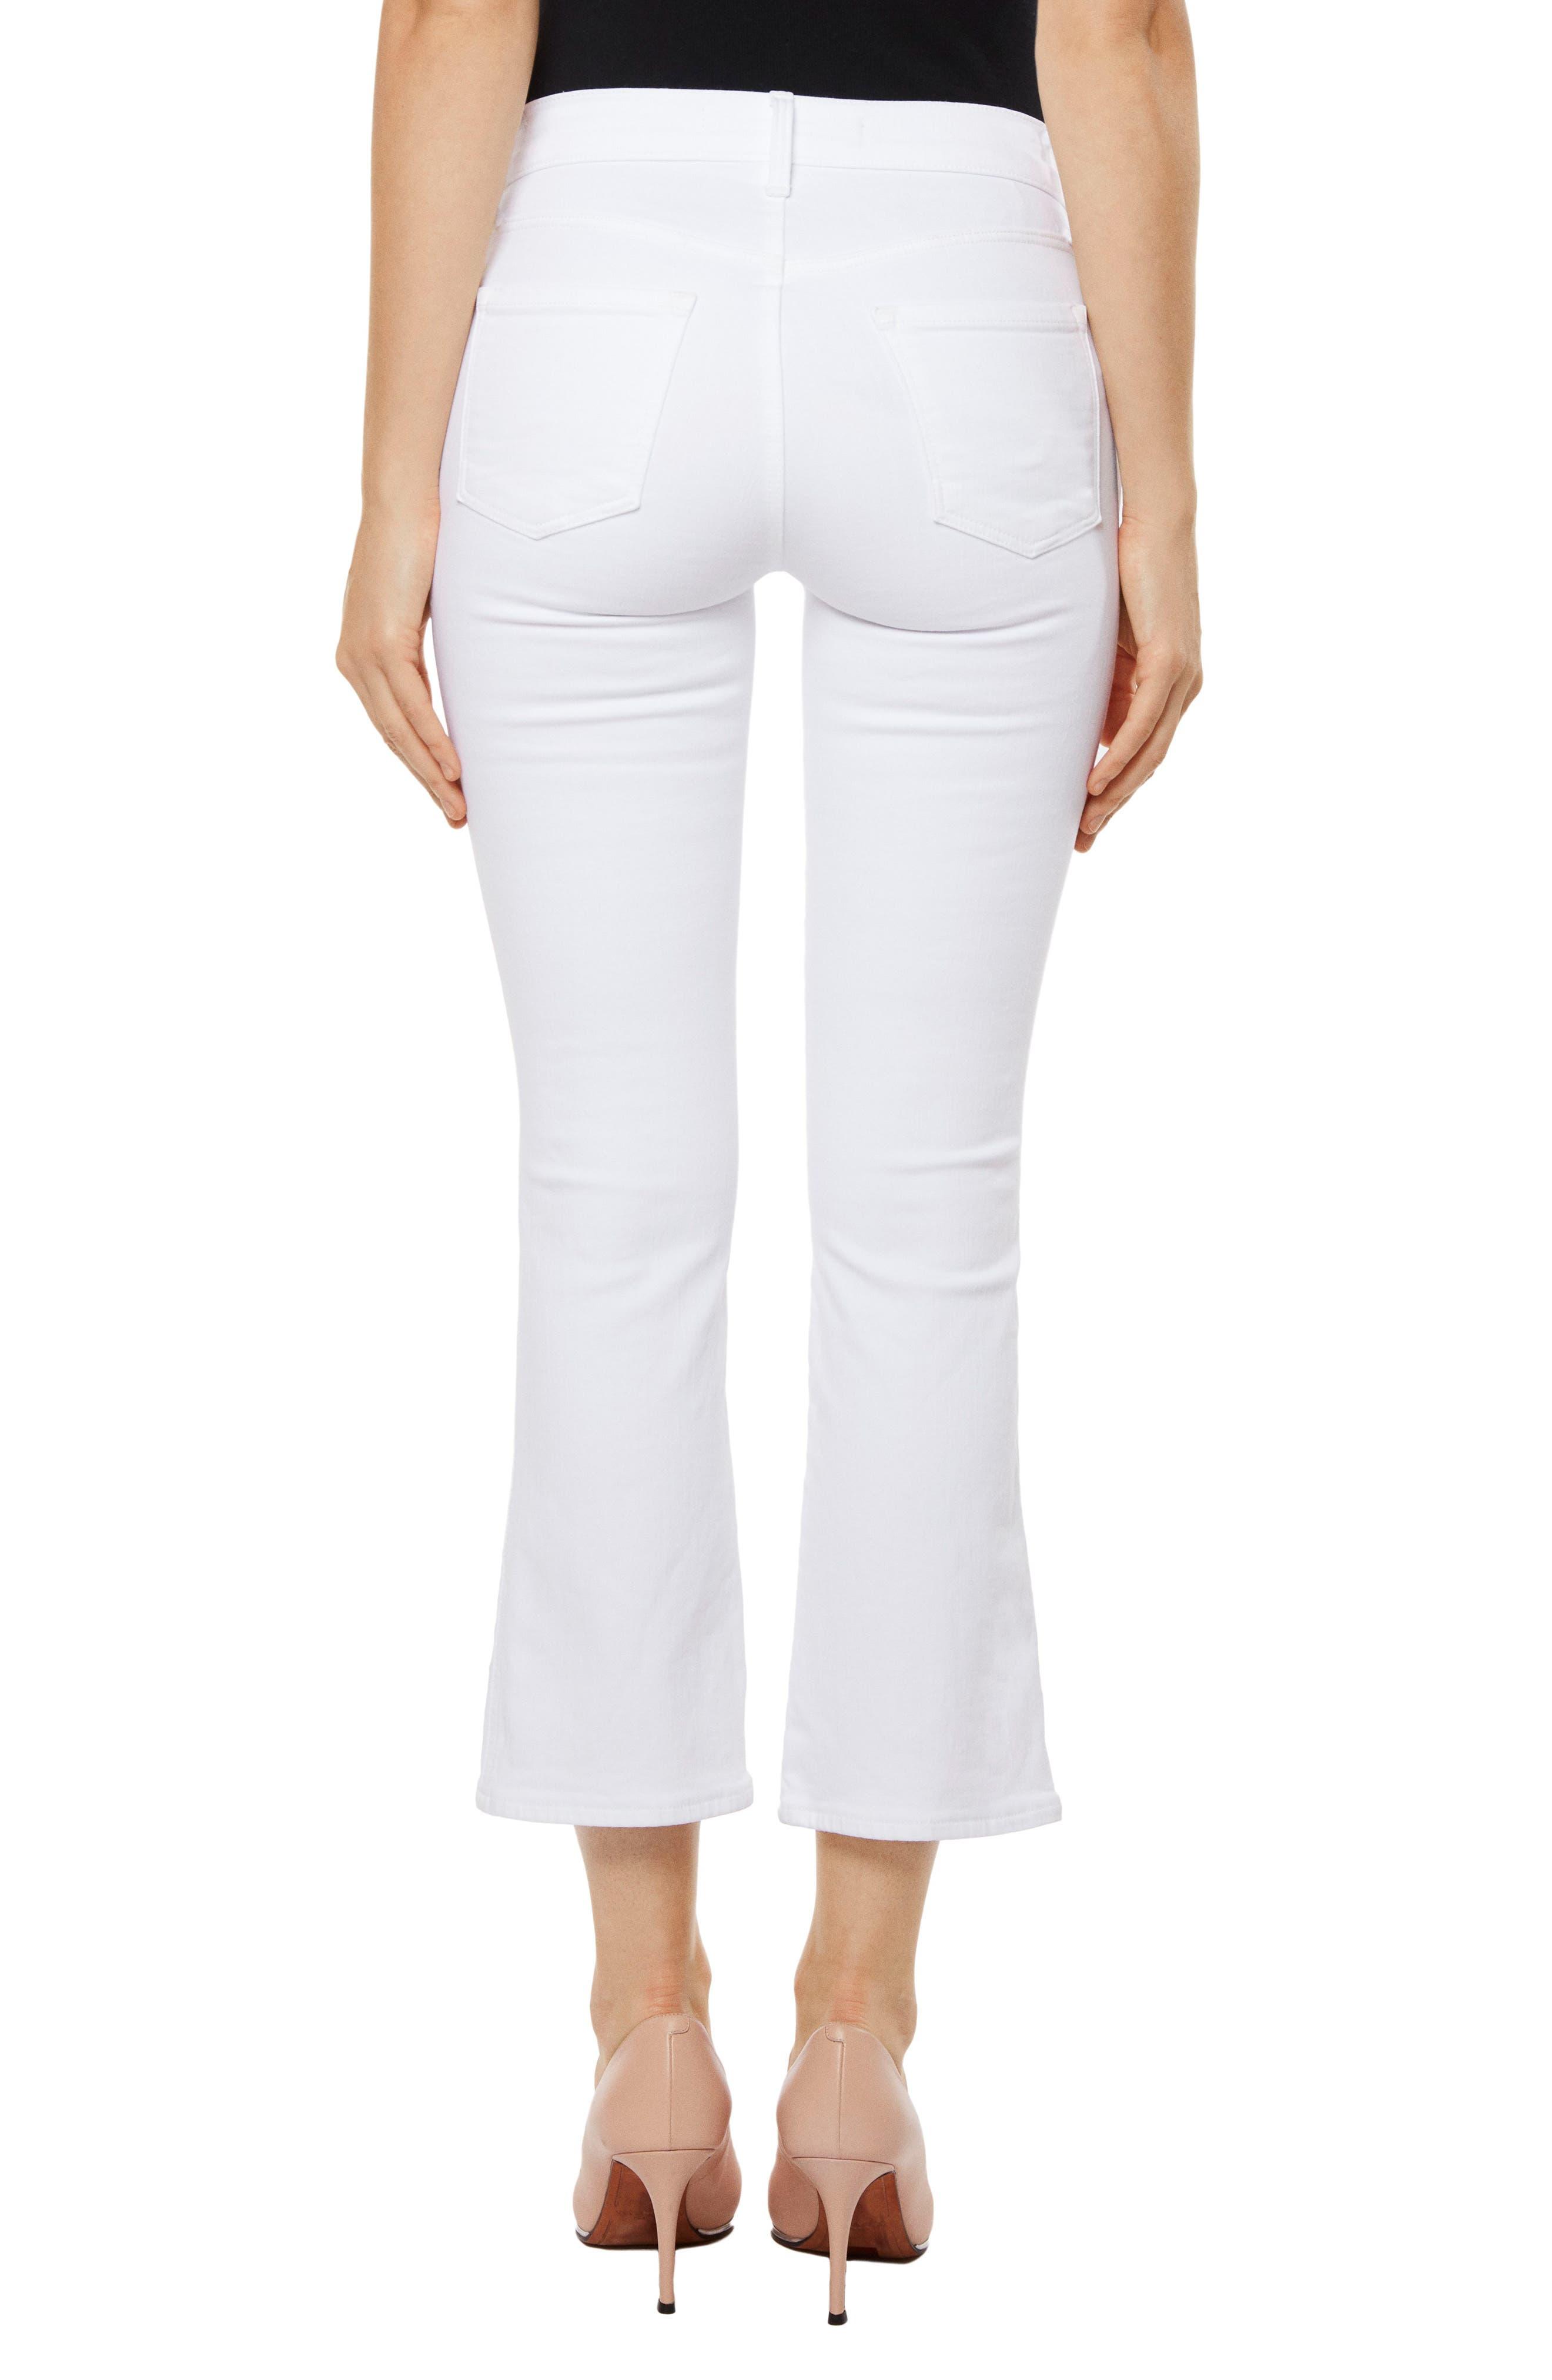 Zion Crop Flare Jeans,                             Alternate thumbnail 2, color,                             Blanc